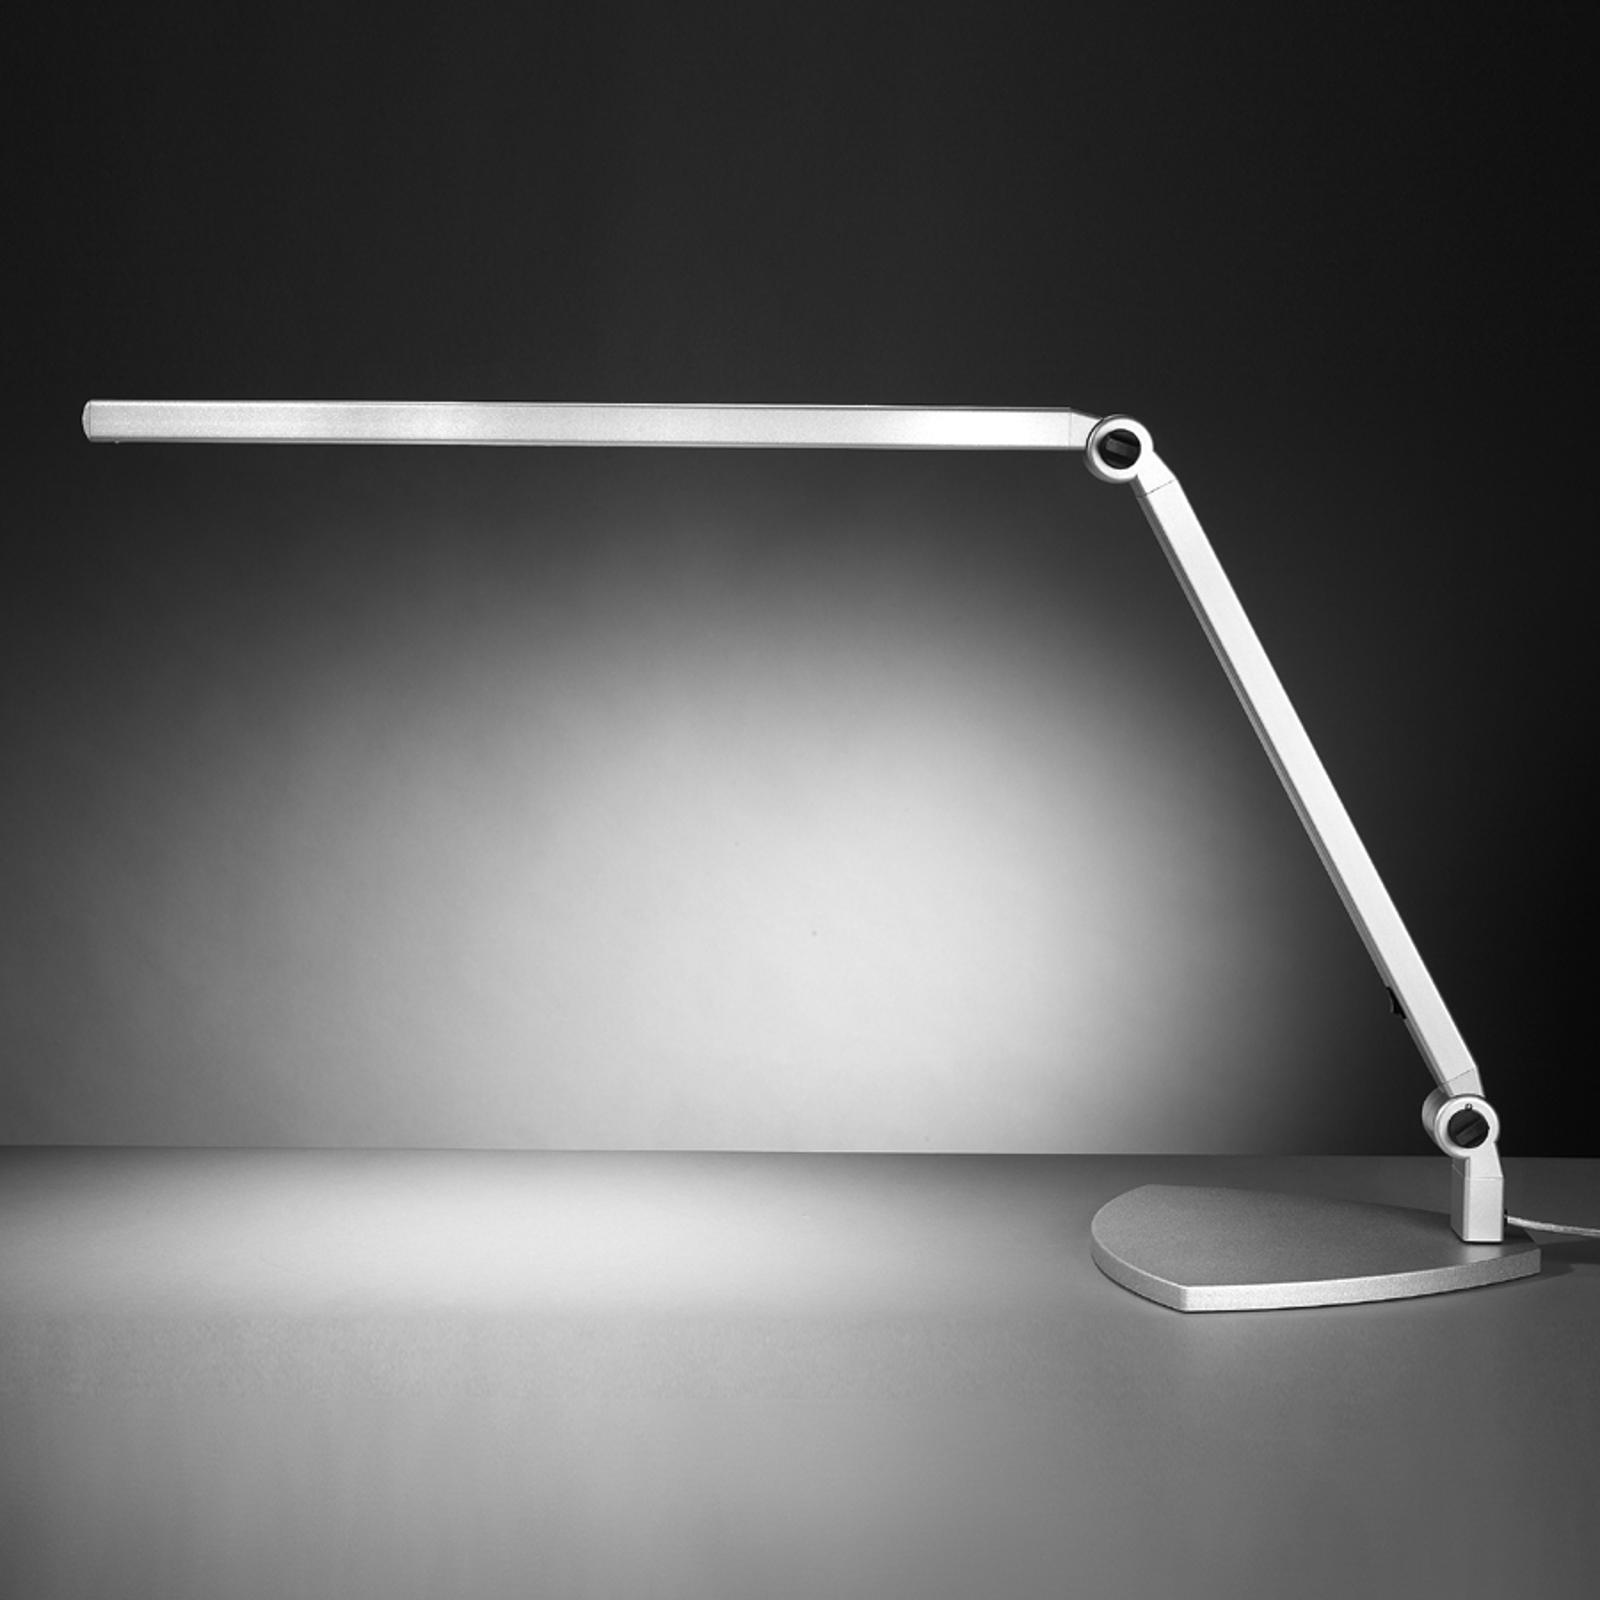 LED tafellamp Take 5 met voet, daglicht, dimbaar